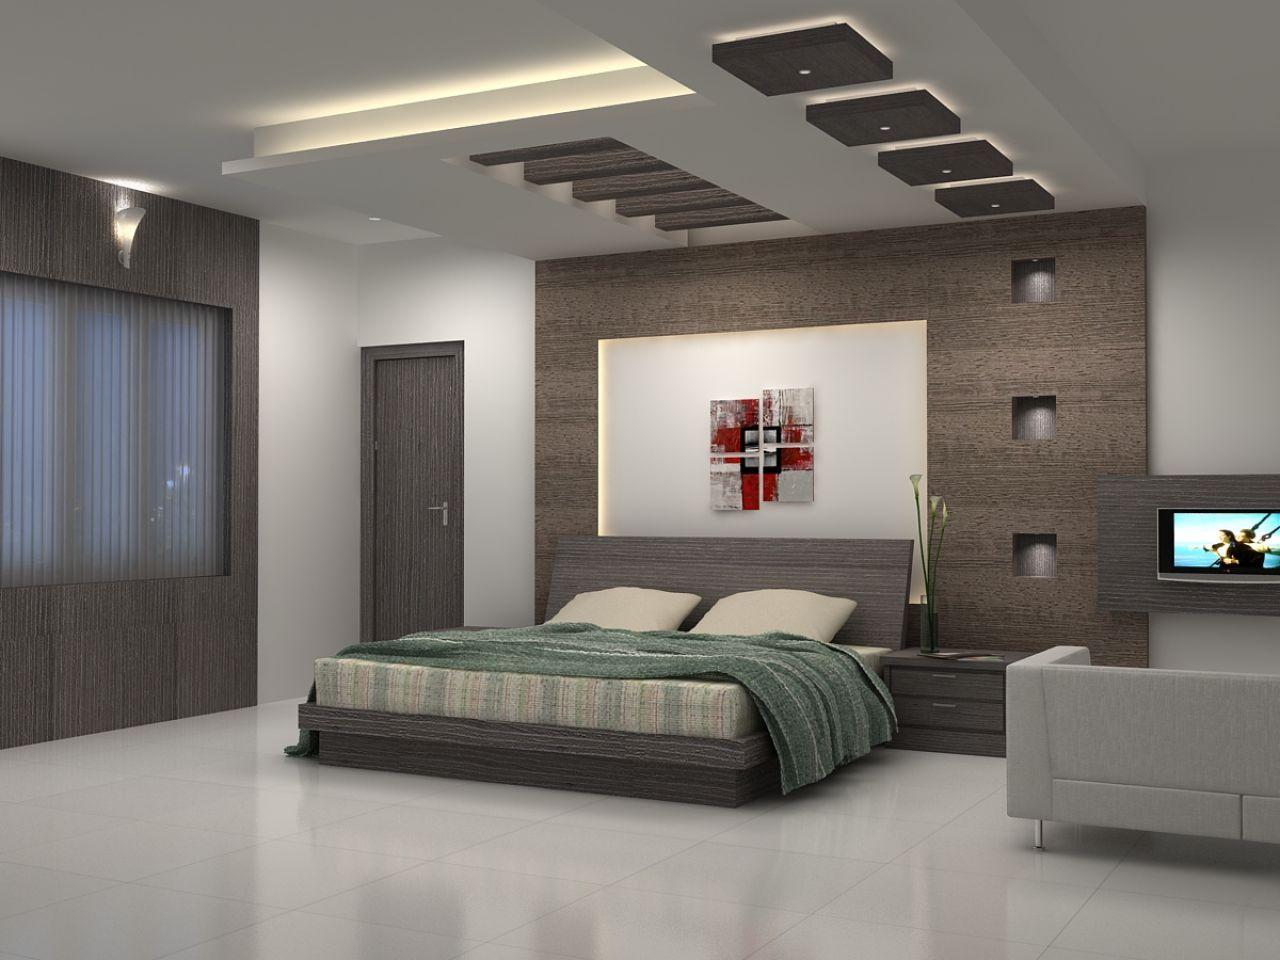 modern ceiling designs for bedroom